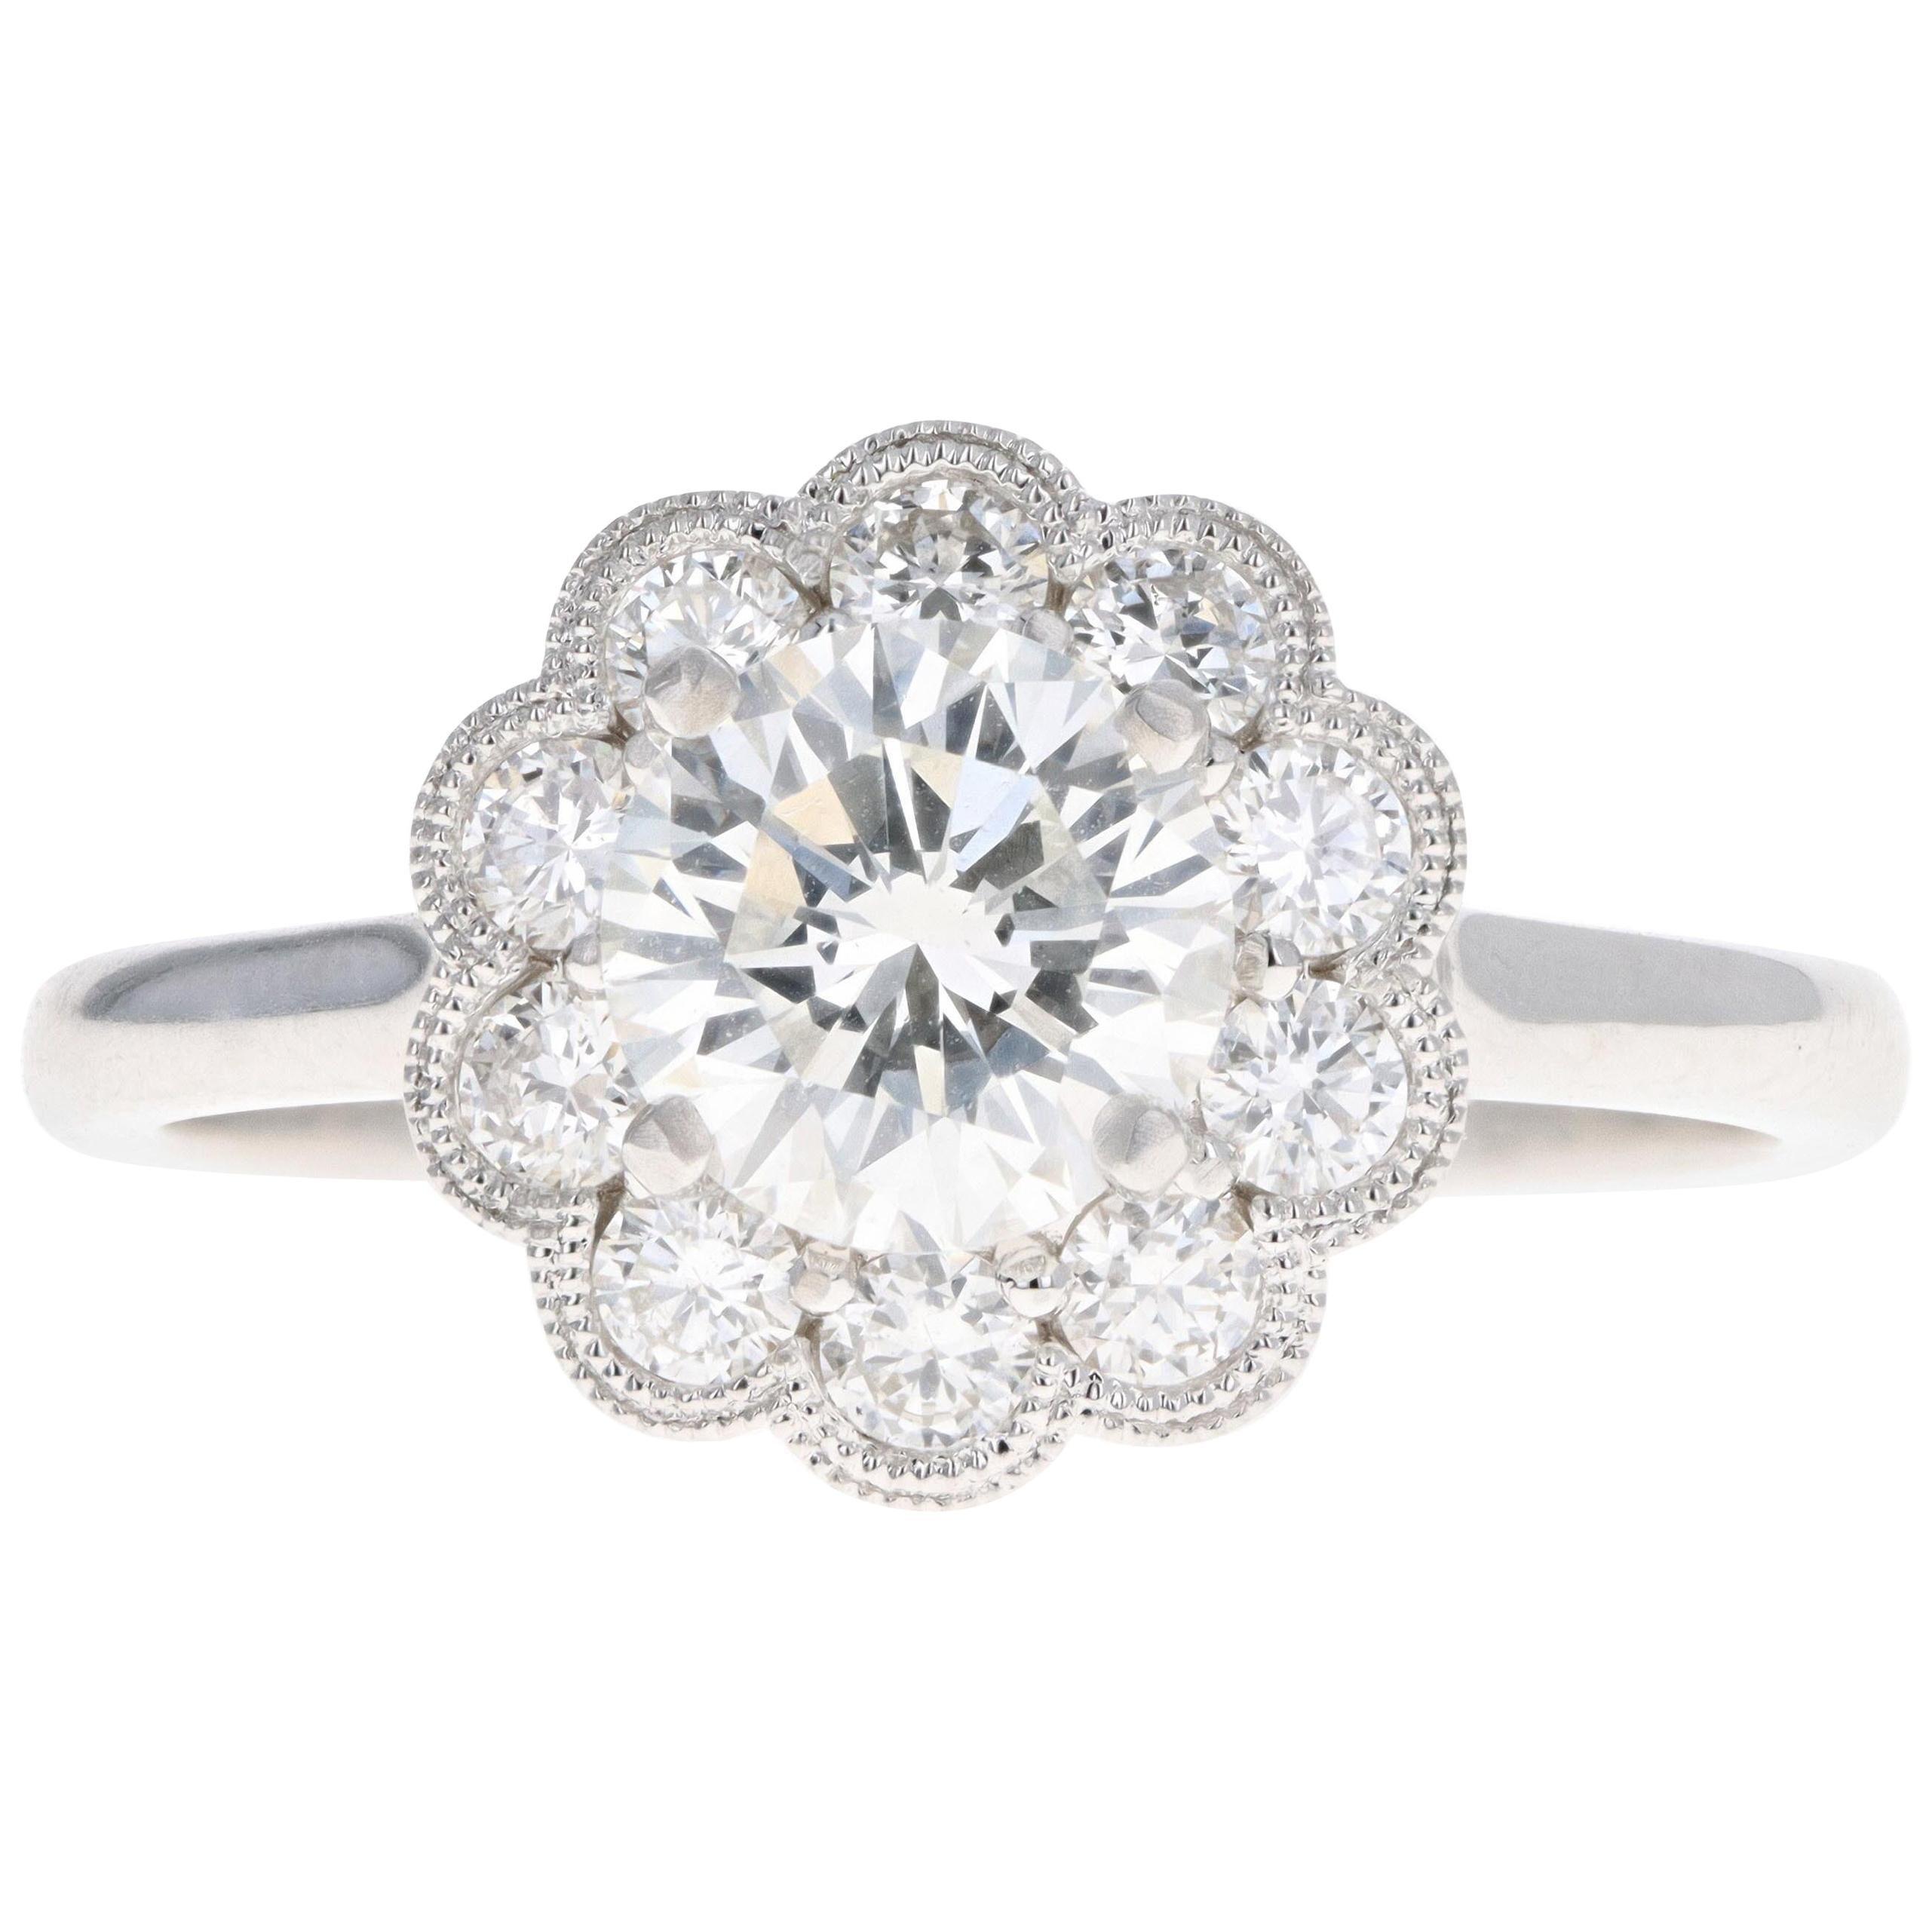 White Gold 1.13 Carat Round Brilliant Diamond Halo Engagement Ring